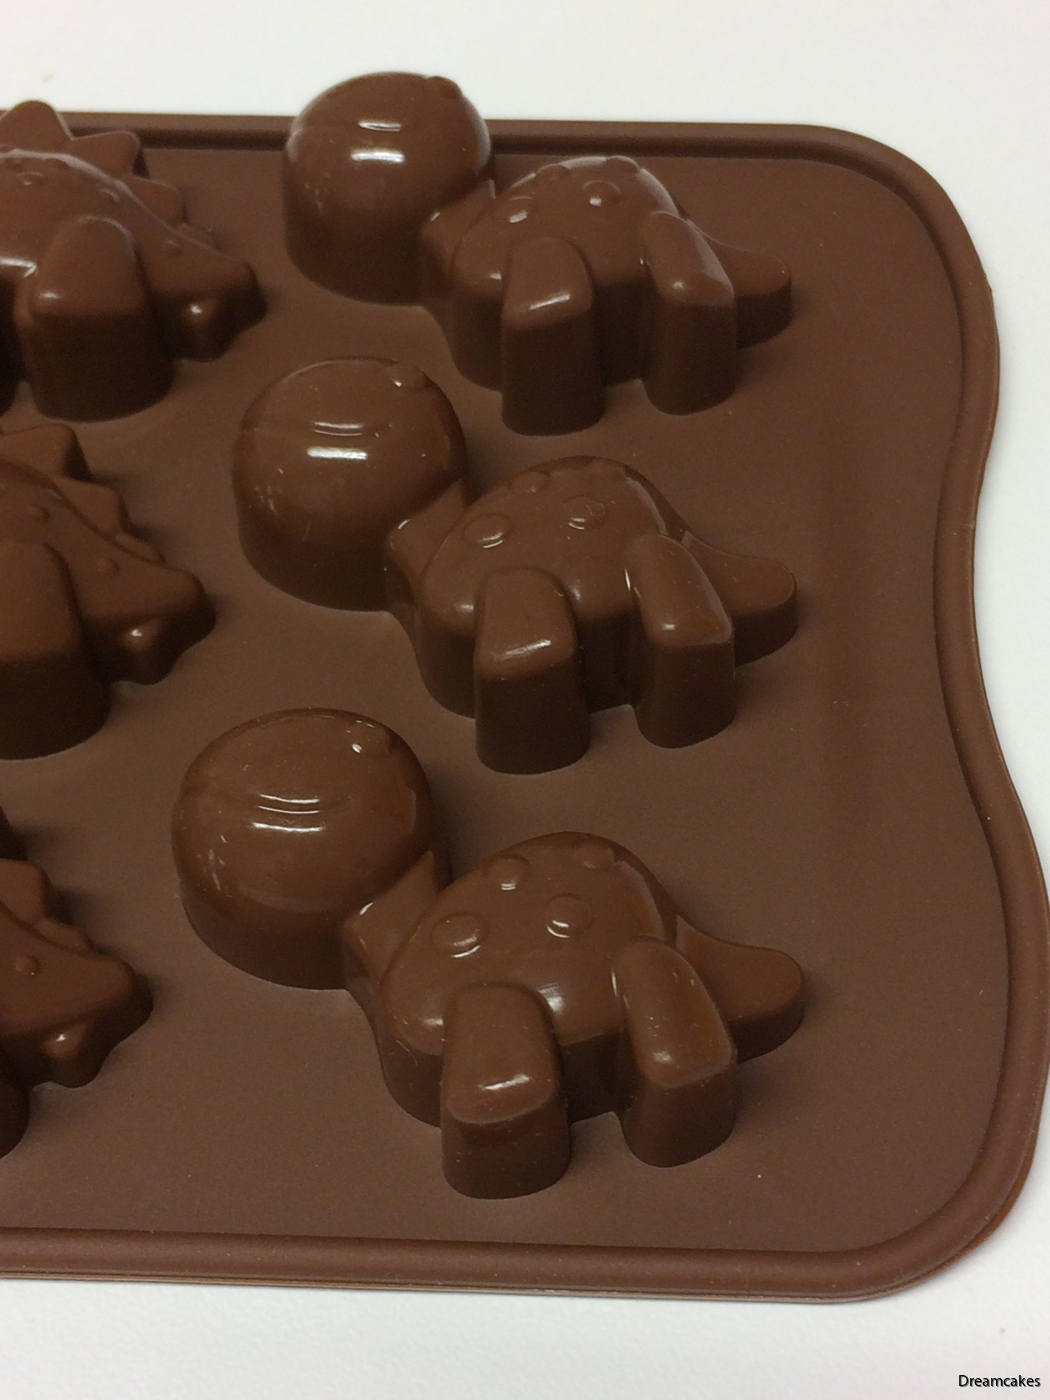 Pralinform, chokladpraliner, dinosauriegodis, dinosaurier av choklad, gjut chokladpraliner i form av dinosaurier